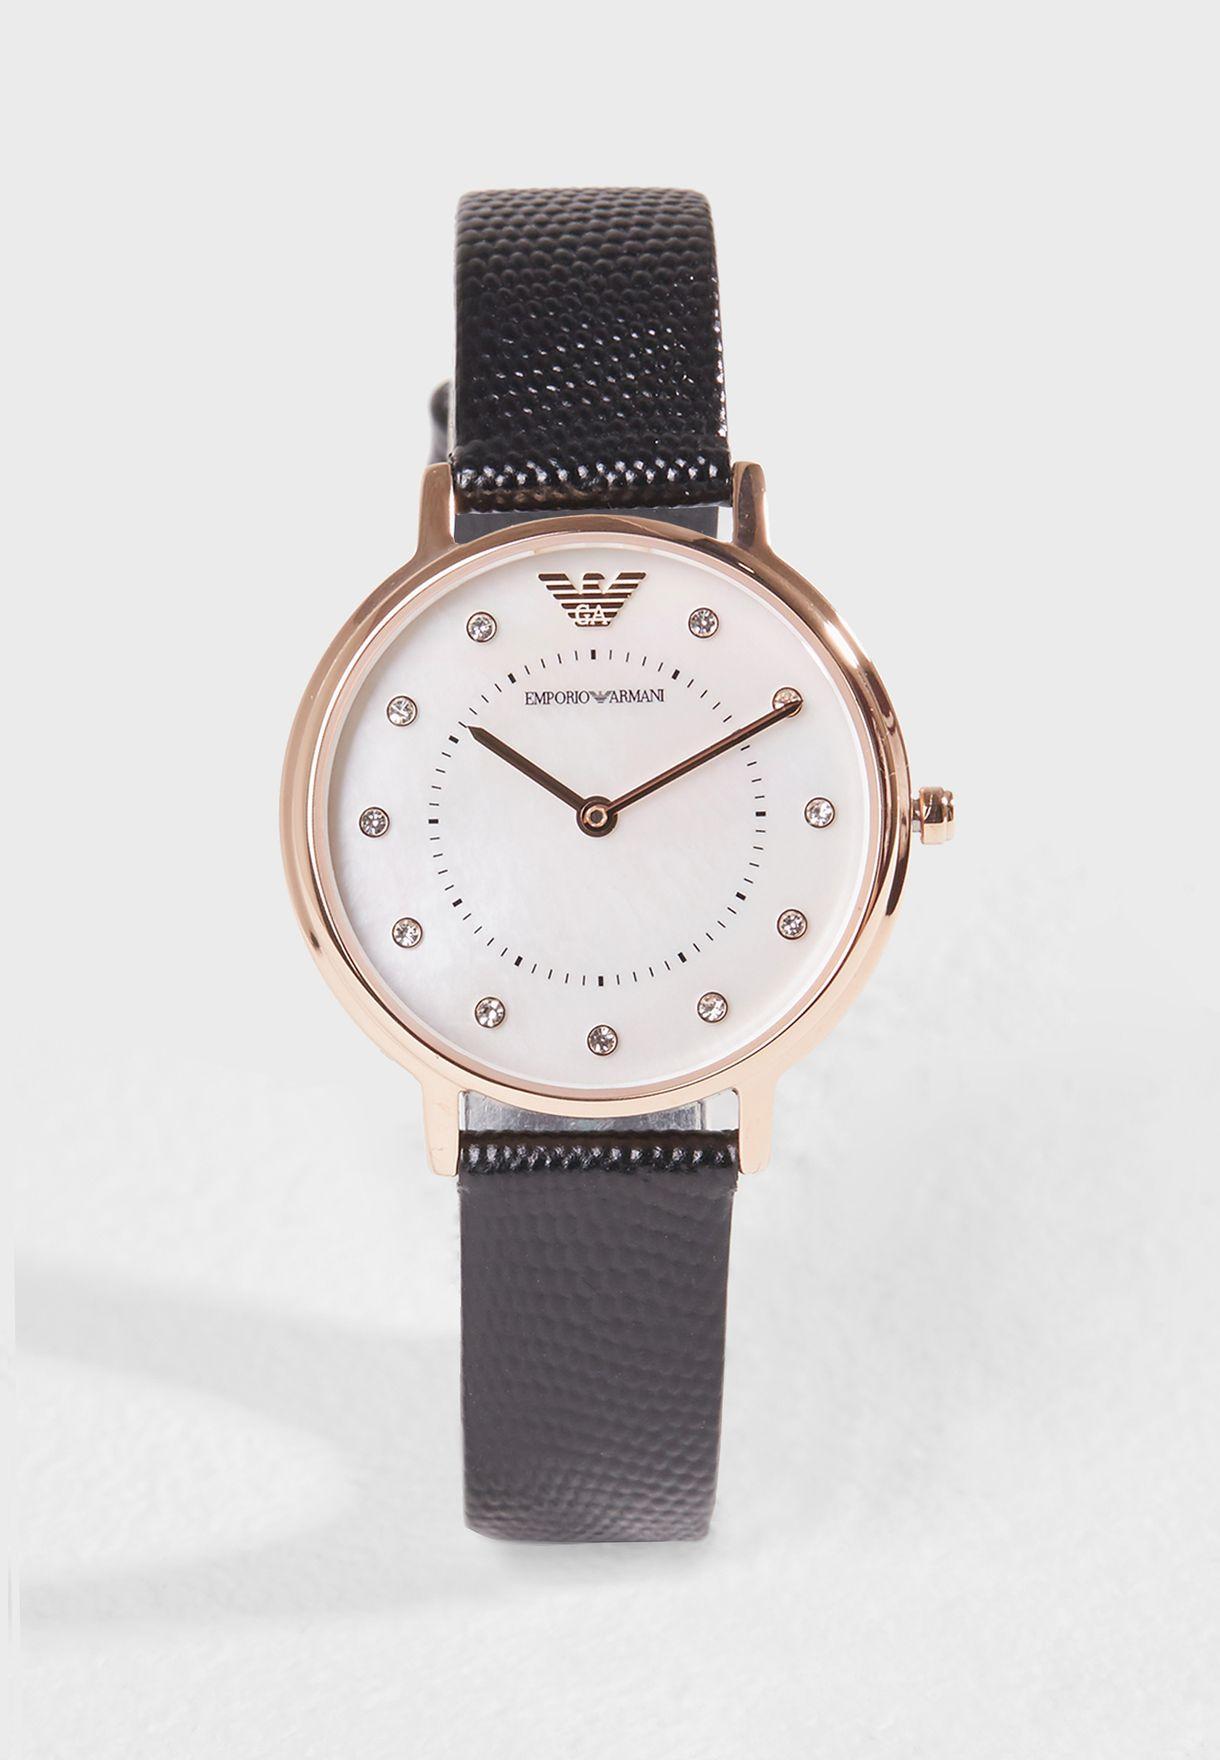 6cbd97d78 تسوق طقم ساعة عصري ماركة امبريو ارماني لون أسود AR80011 في قطر ...